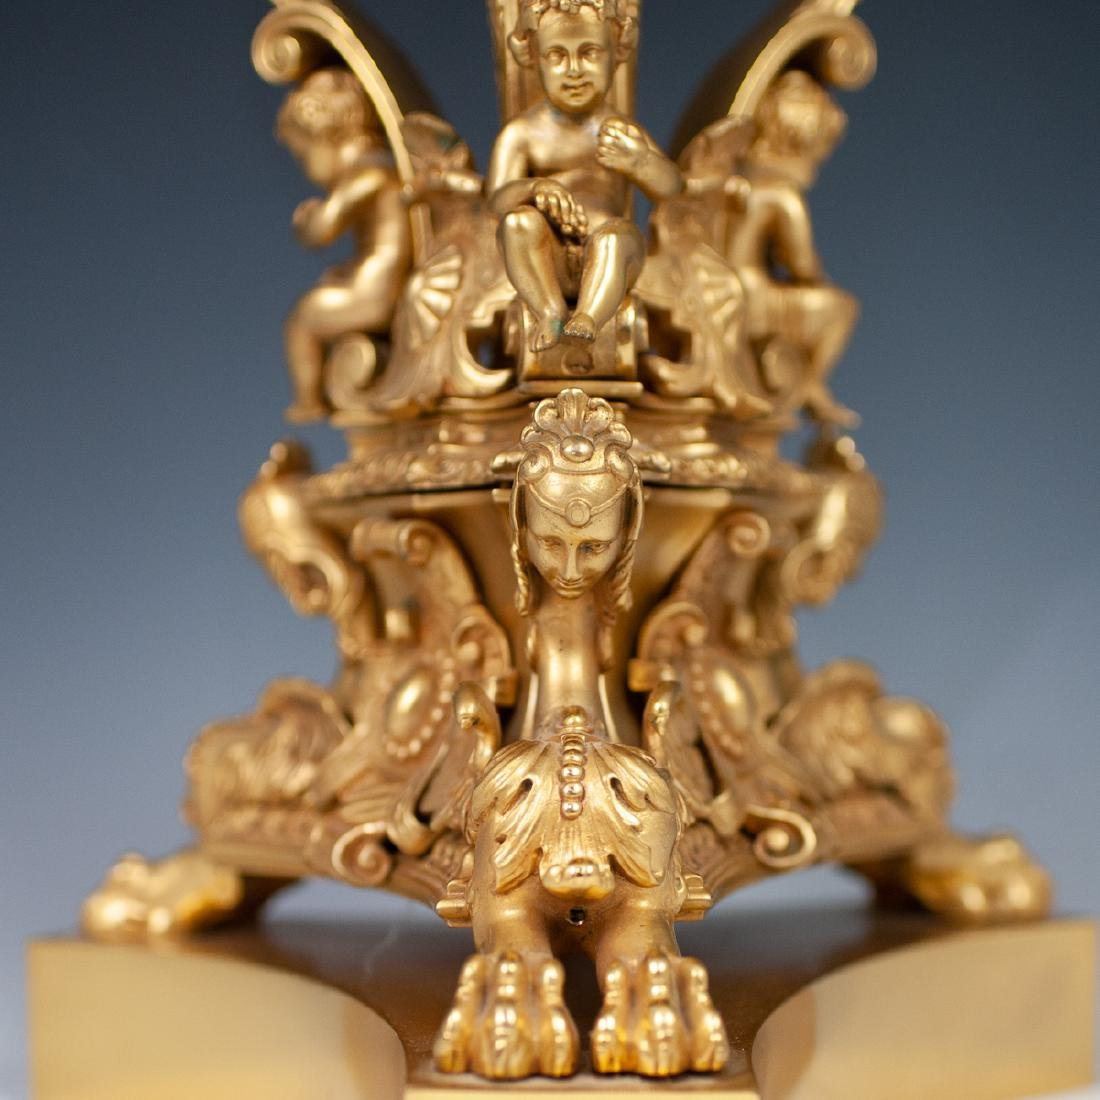 Antique imperial style centerpiece - 7